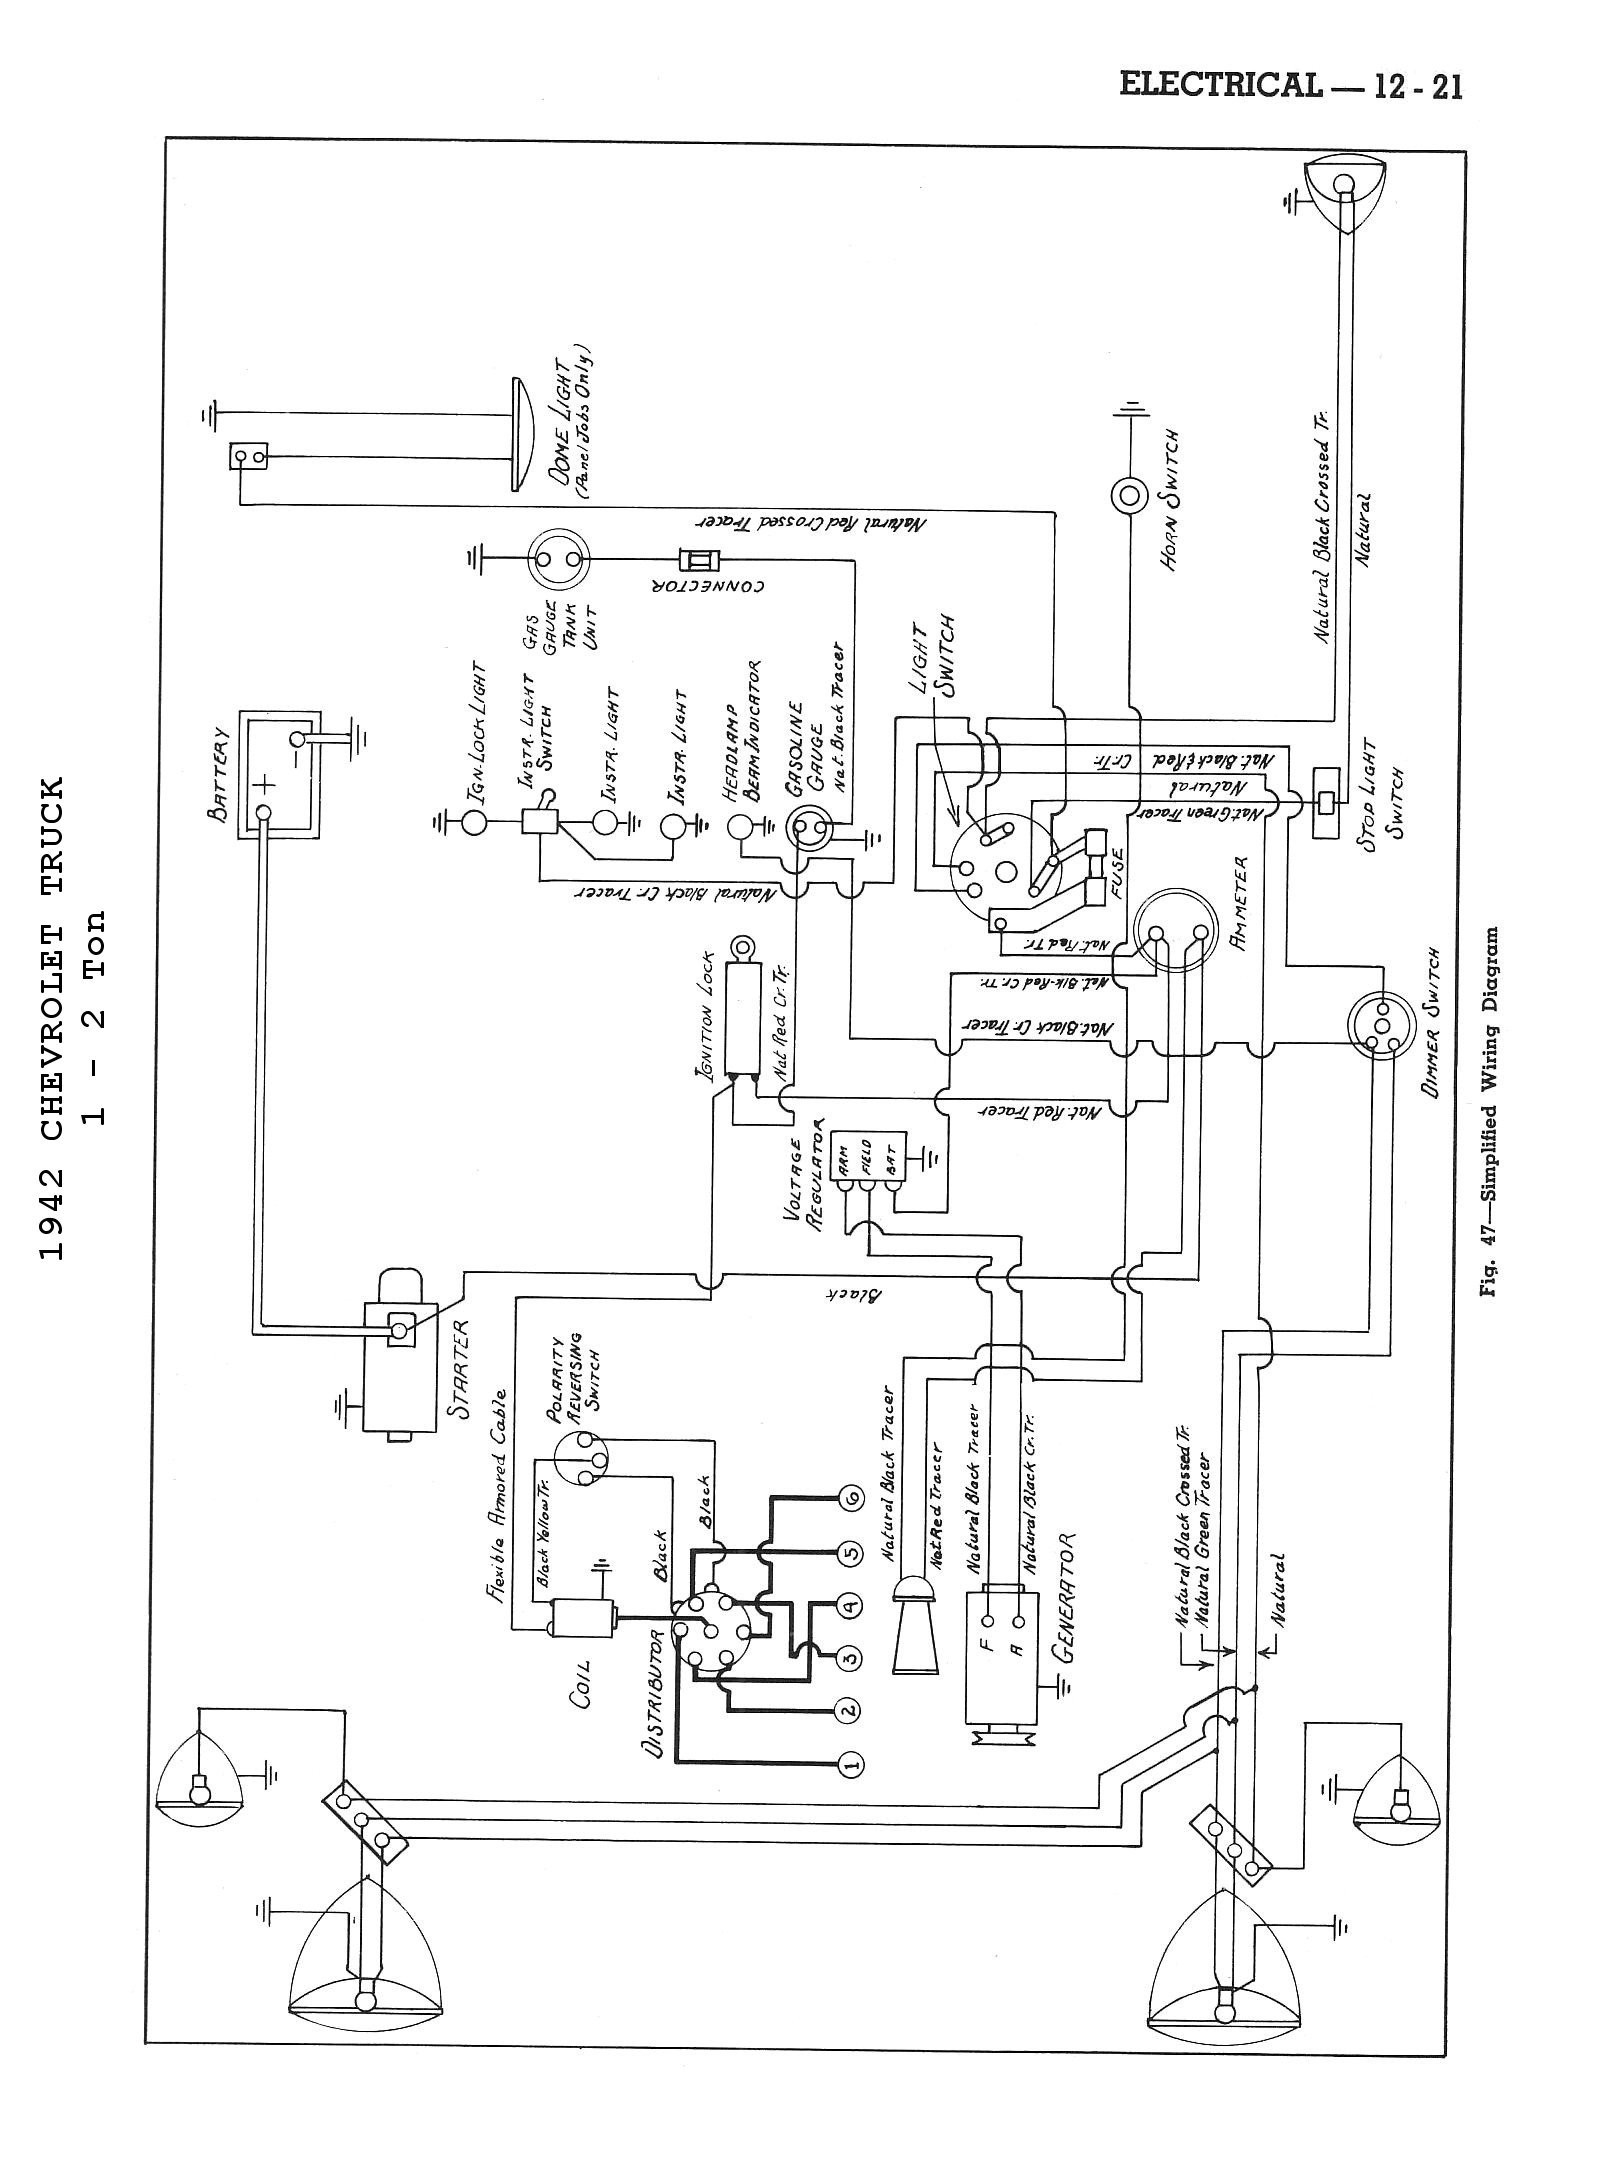 Turn Signal Diagram Turn Signal Wiring Diagram Chevy Truck Shahsramblings Of Turn Signal Diagram